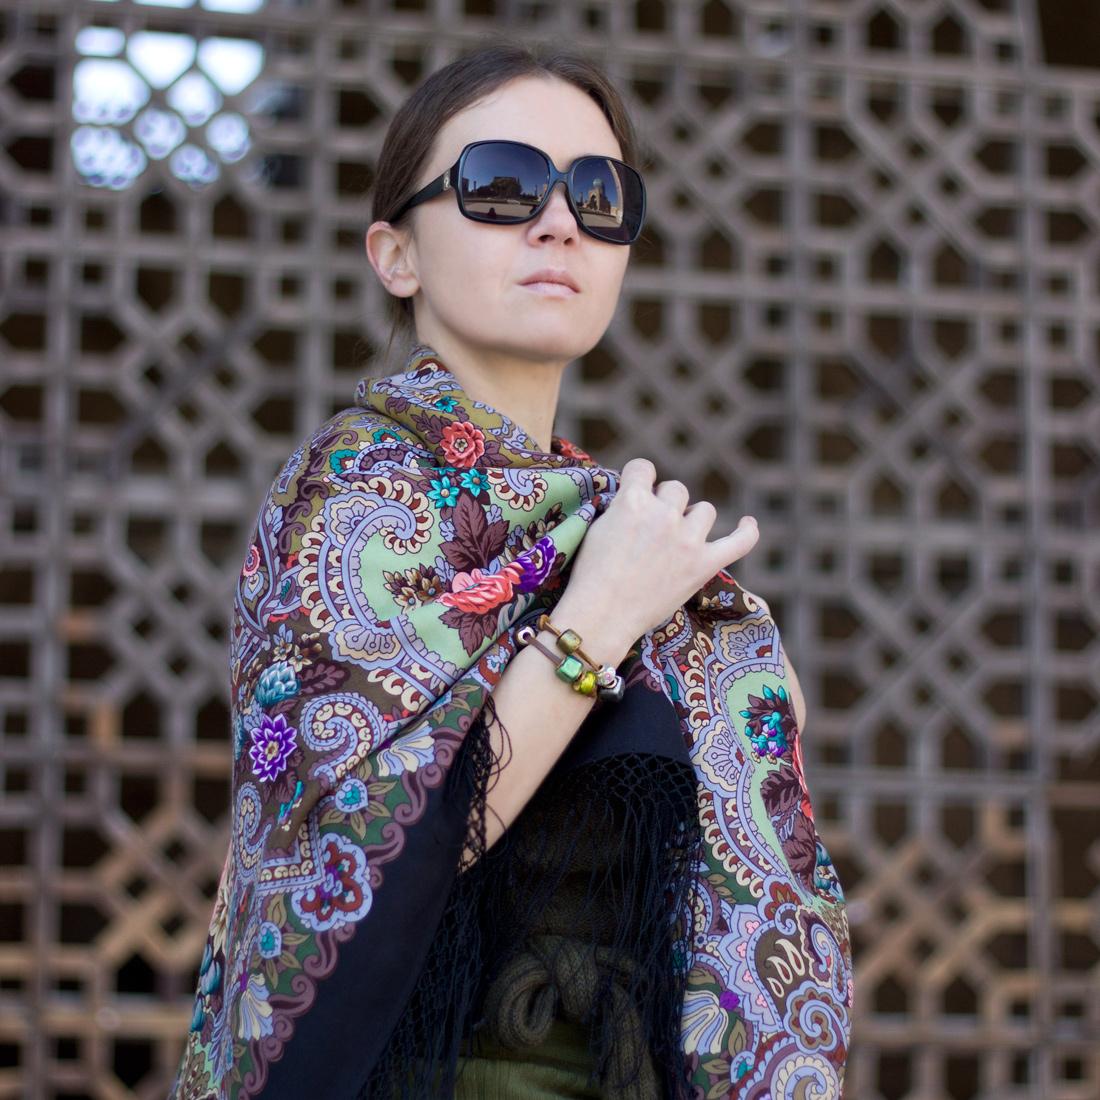 mulberry whisper venetian glass beads for my russian shawl rh mulberrywhisper com  how do you wear wrap bracelets